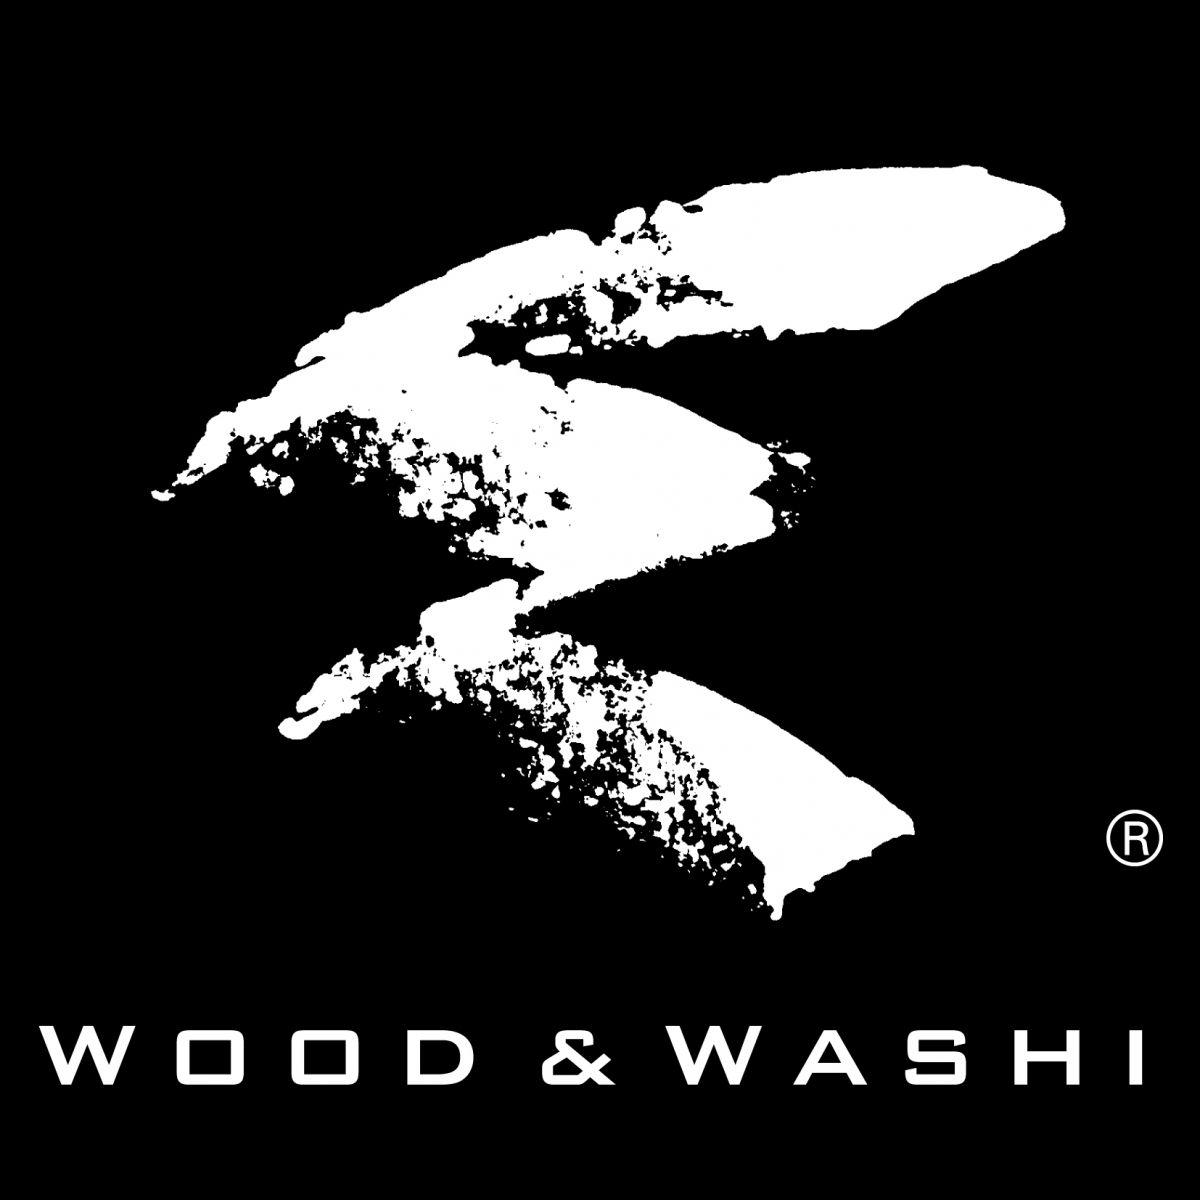 Wood & Washi